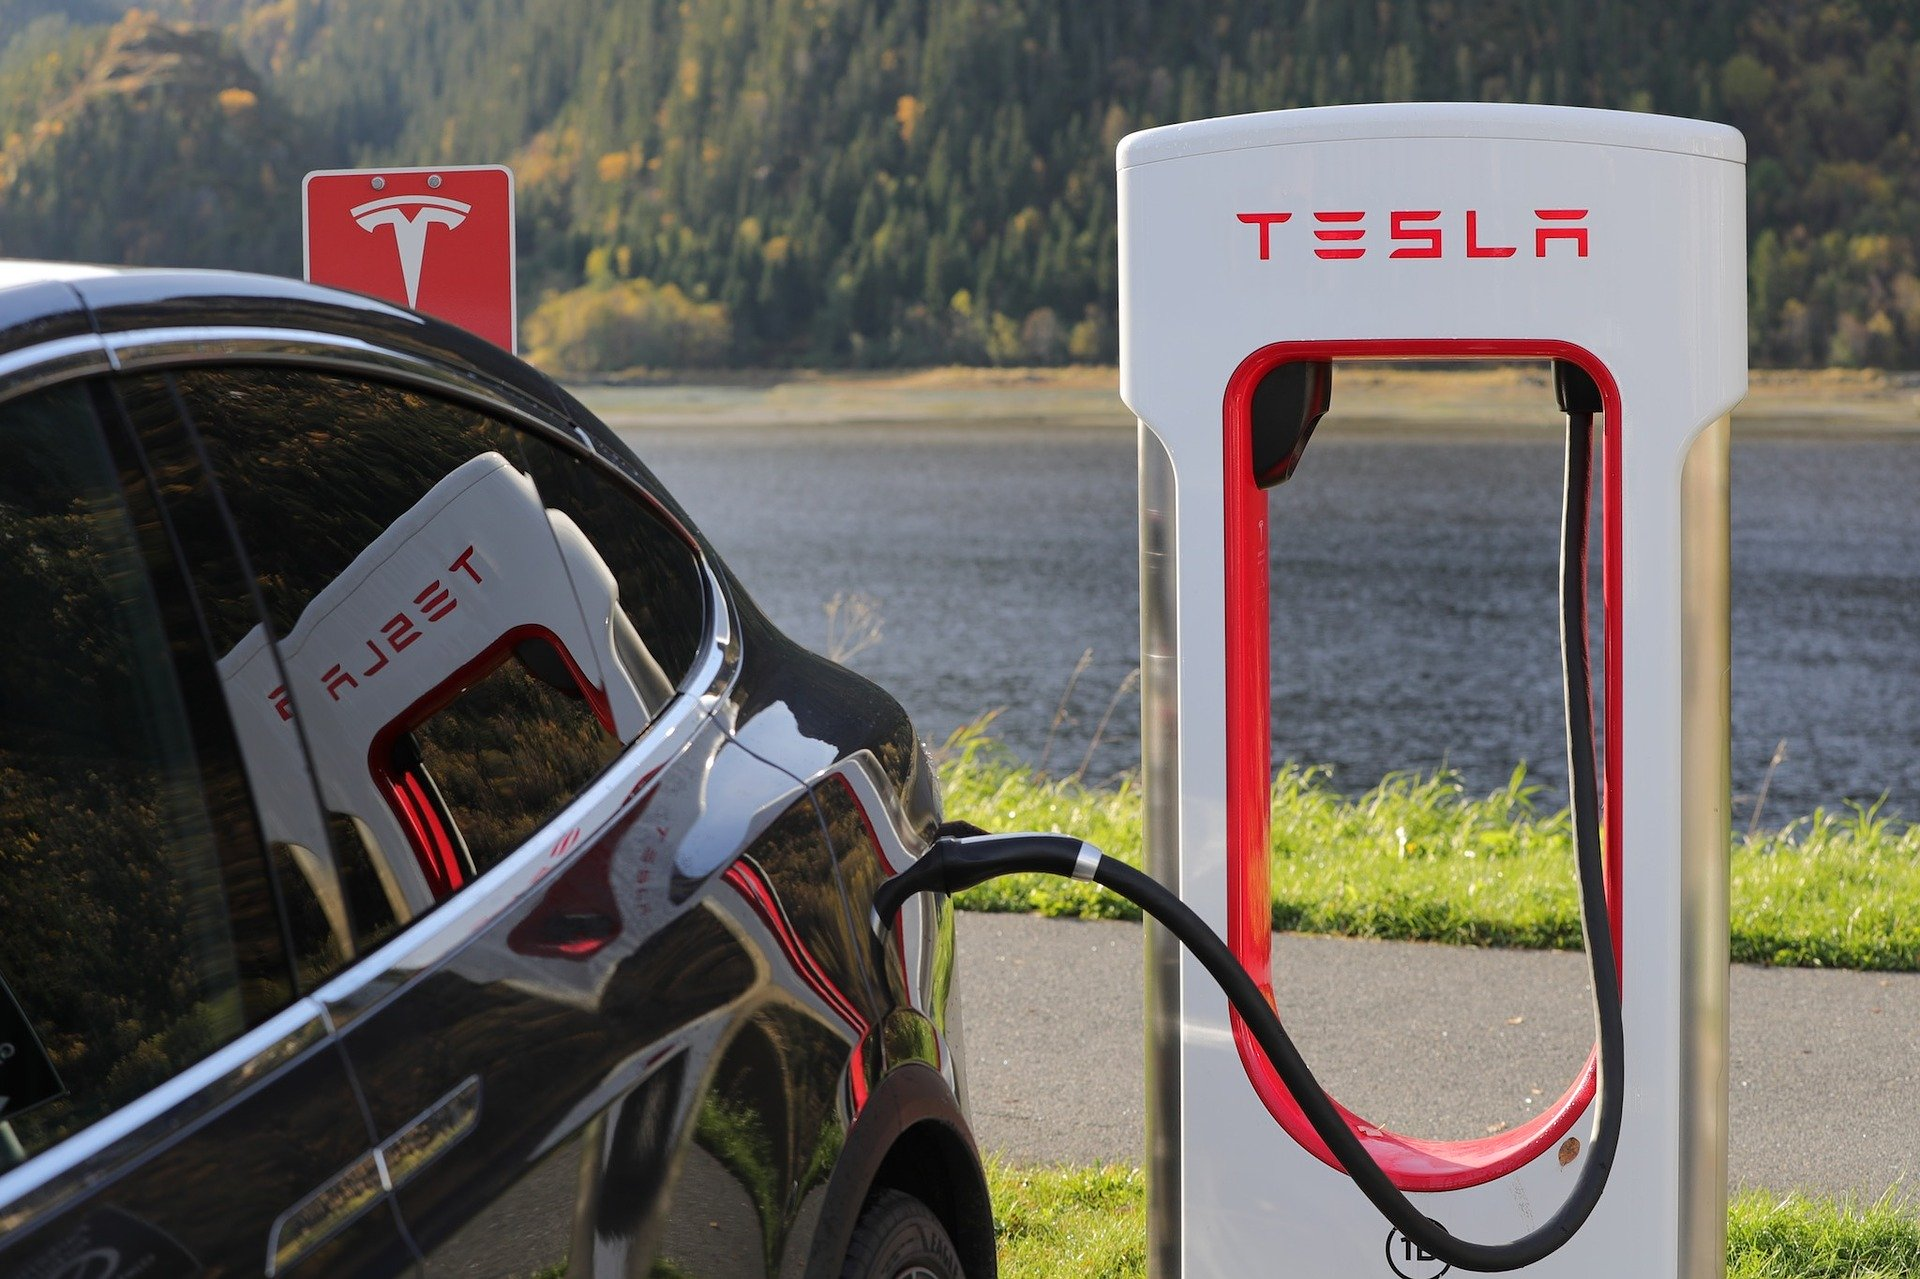 Tesla Elektro-Auto ladet an einer Ladesäule